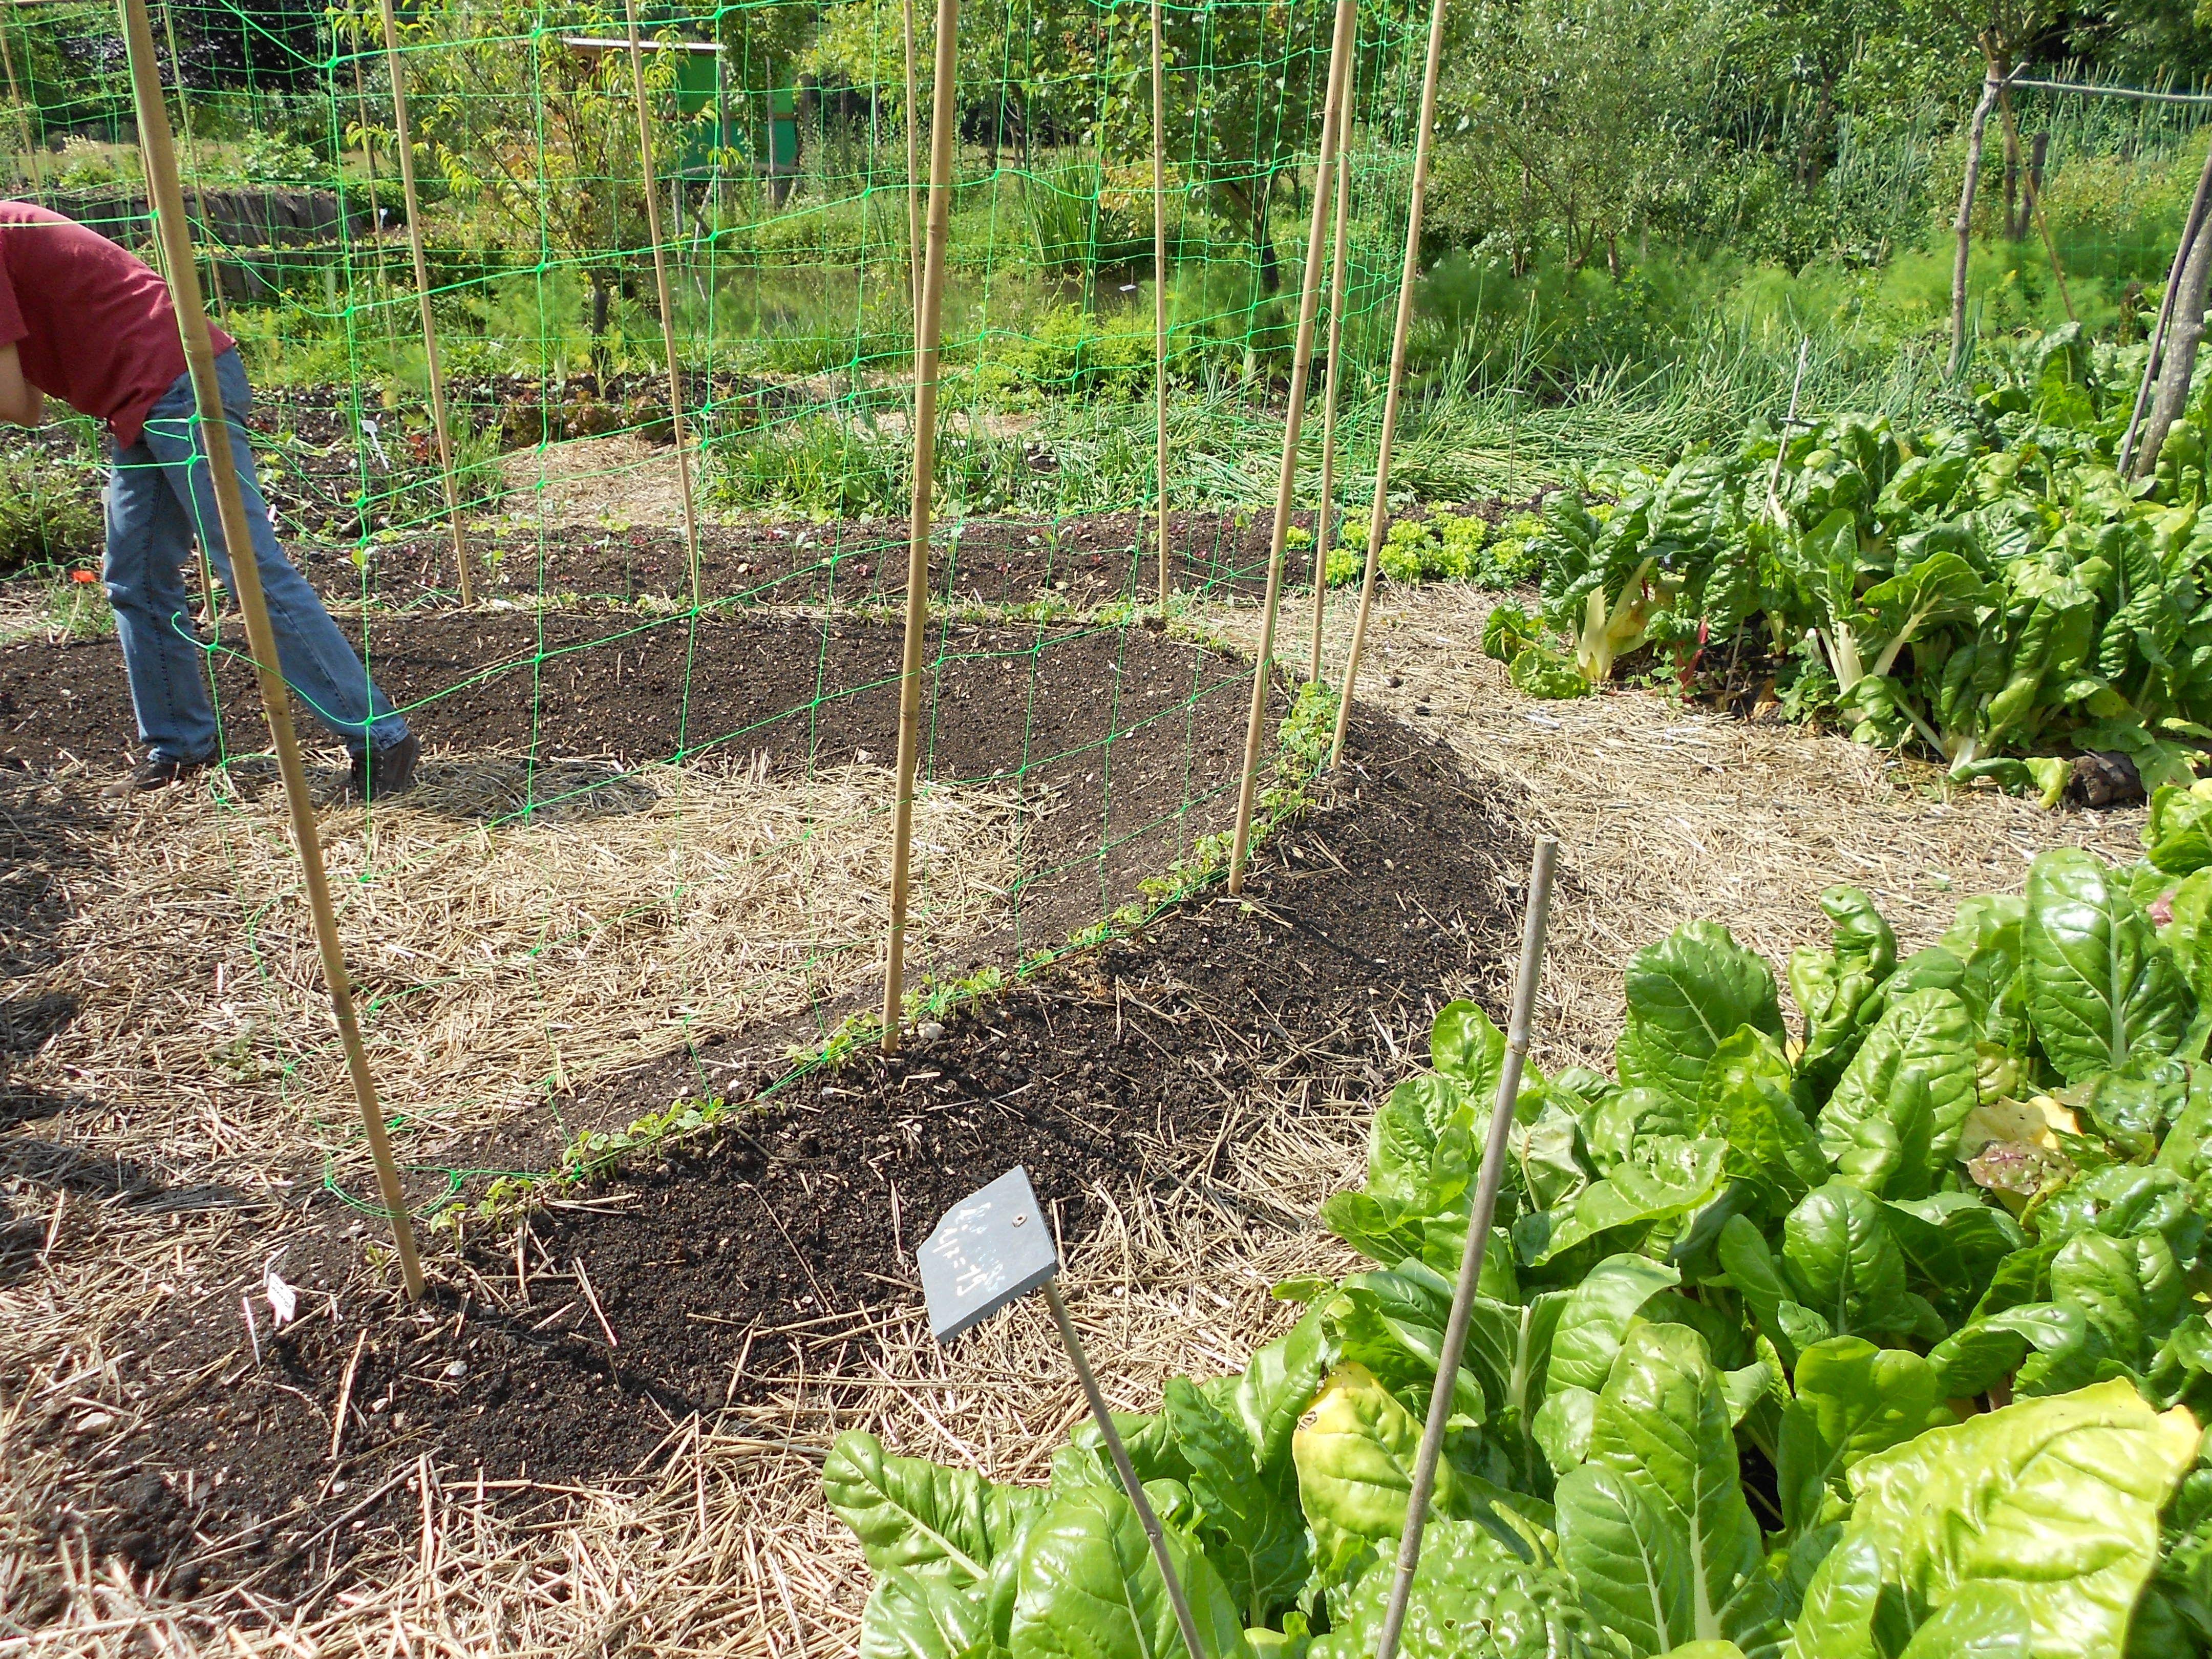 jardin potager mandala recherche google jardin mandala pinterest jardinage plantation. Black Bedroom Furniture Sets. Home Design Ideas